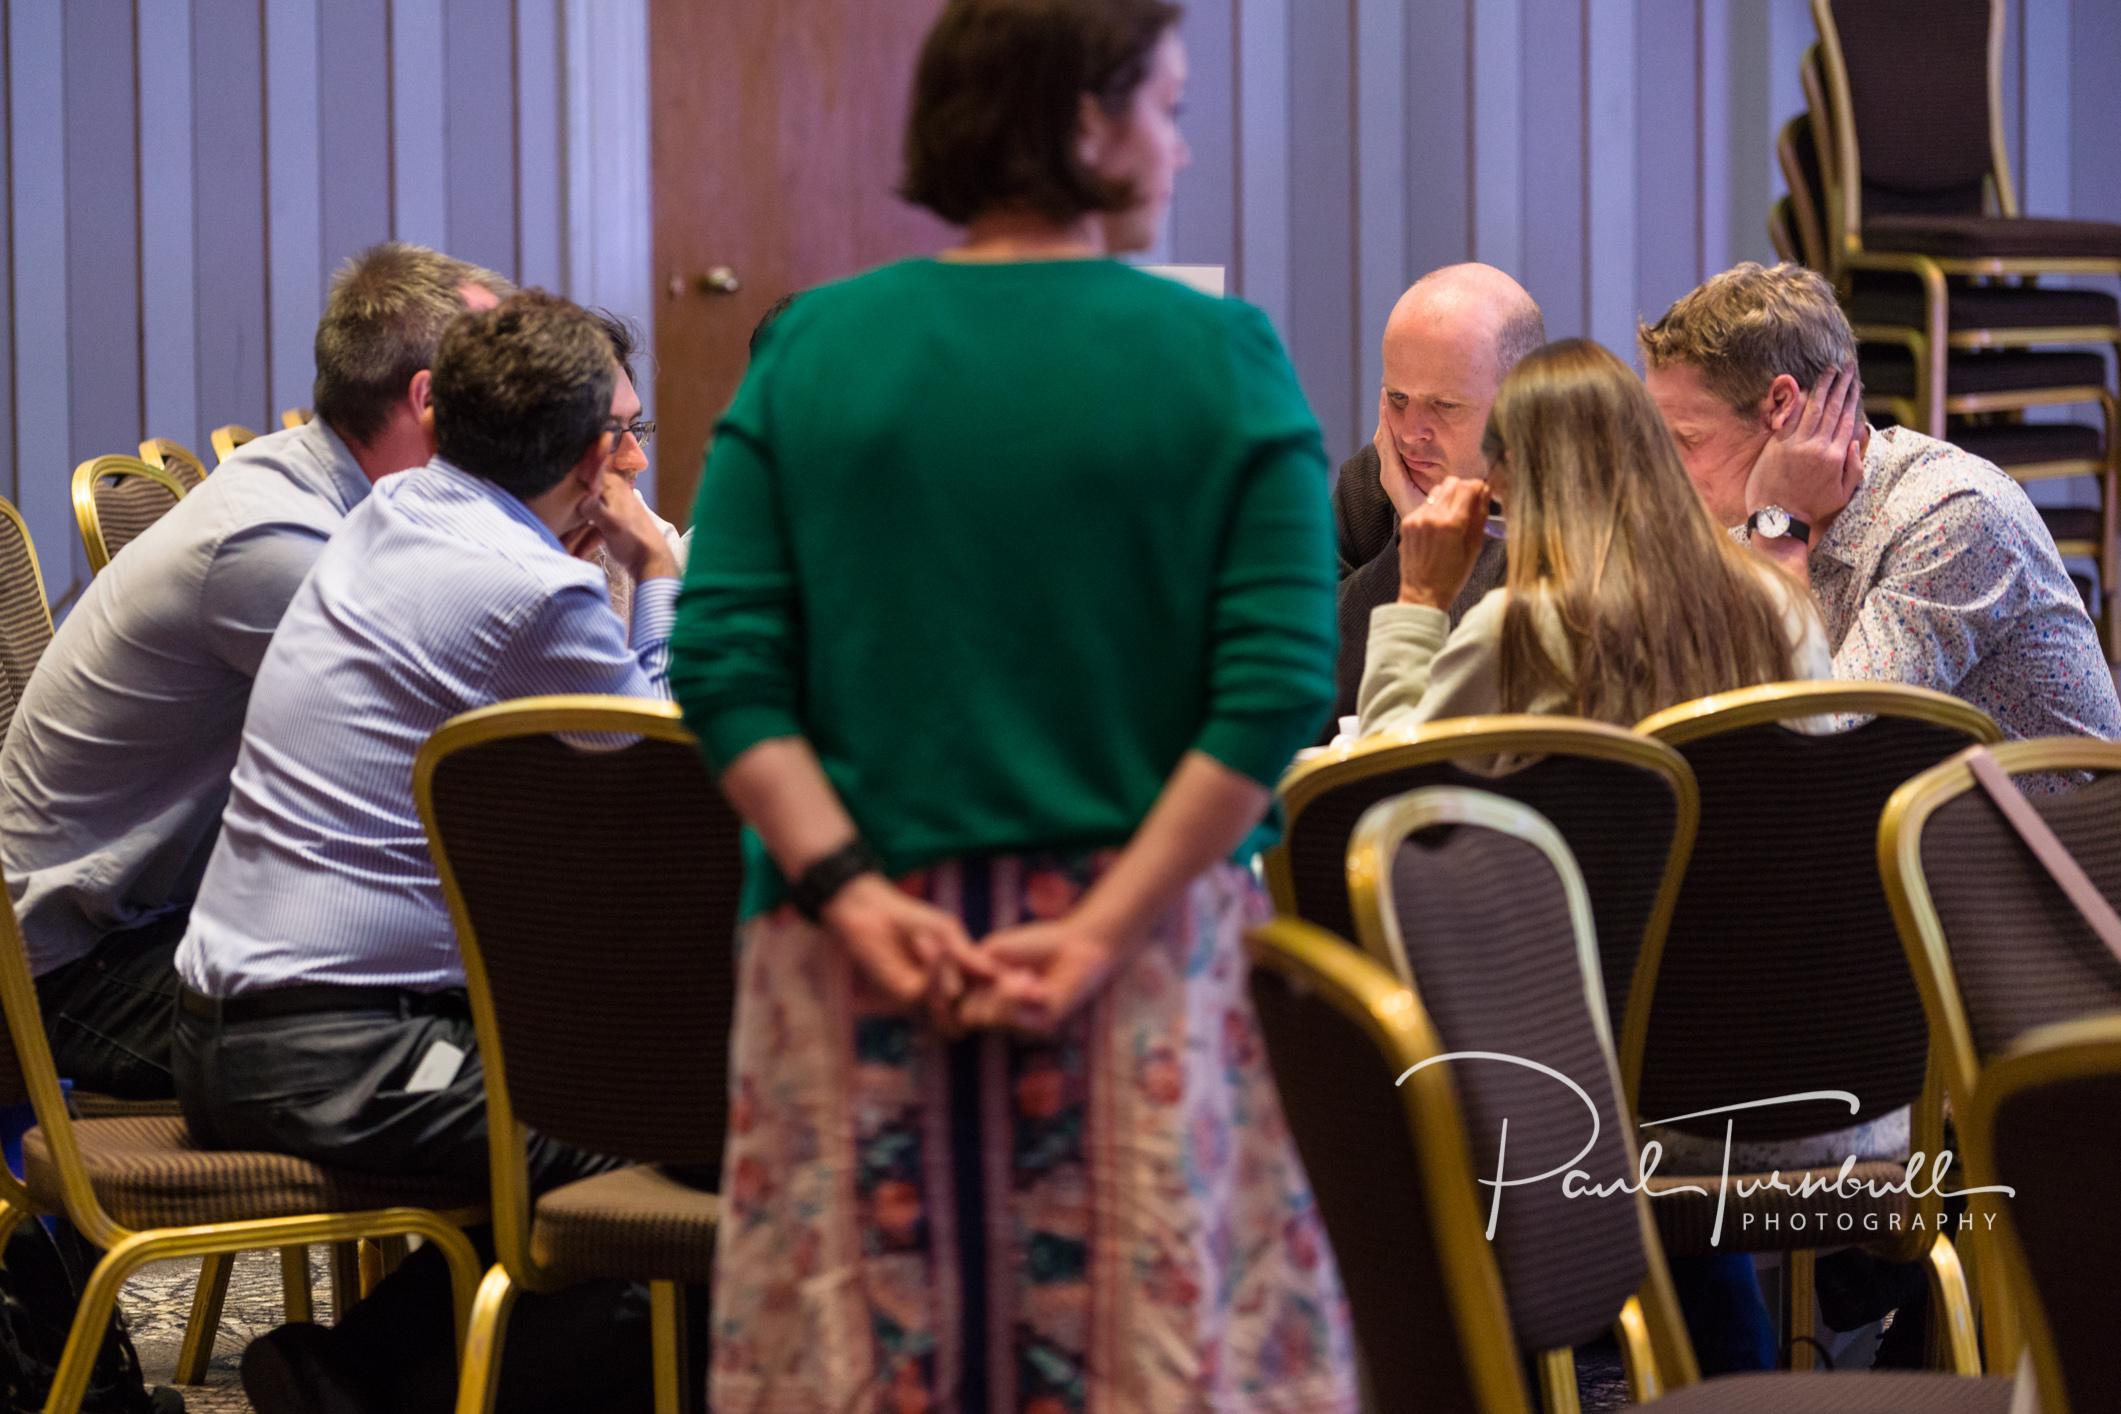 conference-event-photographer-queens-hotel-leeds-yorkshire-068.jpg